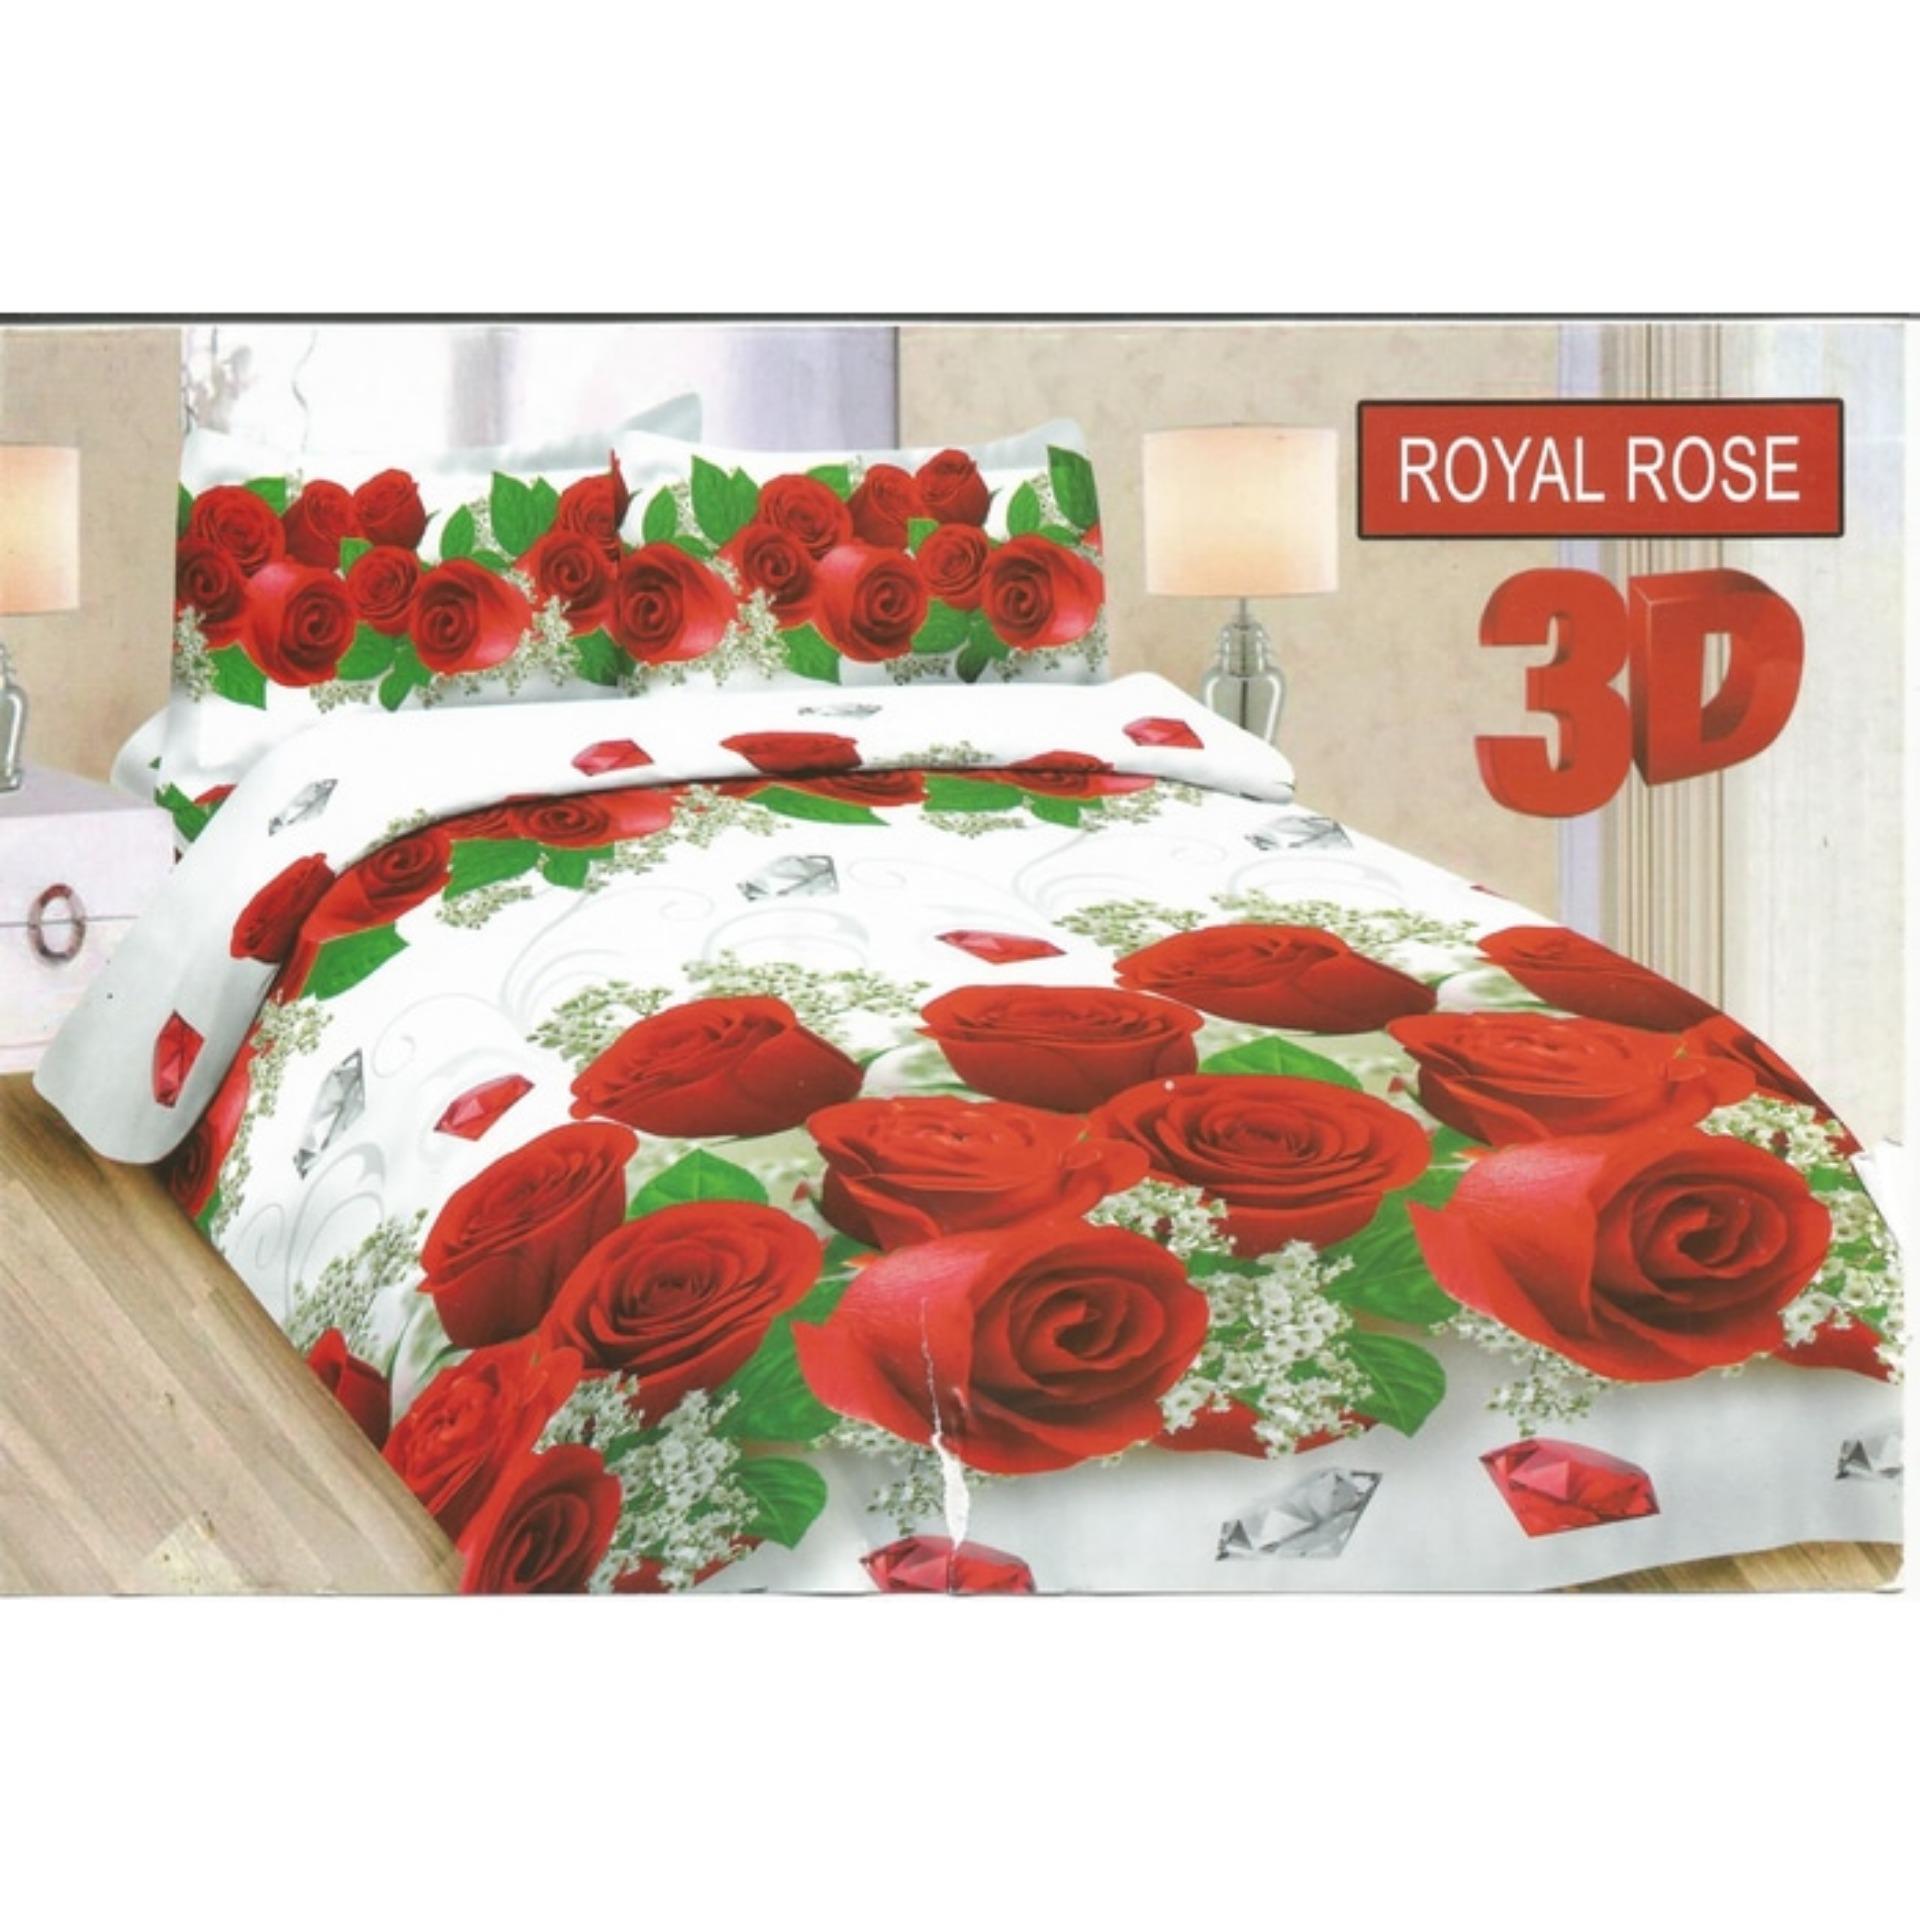 180 Sprei Bonita Royal Rose No.1